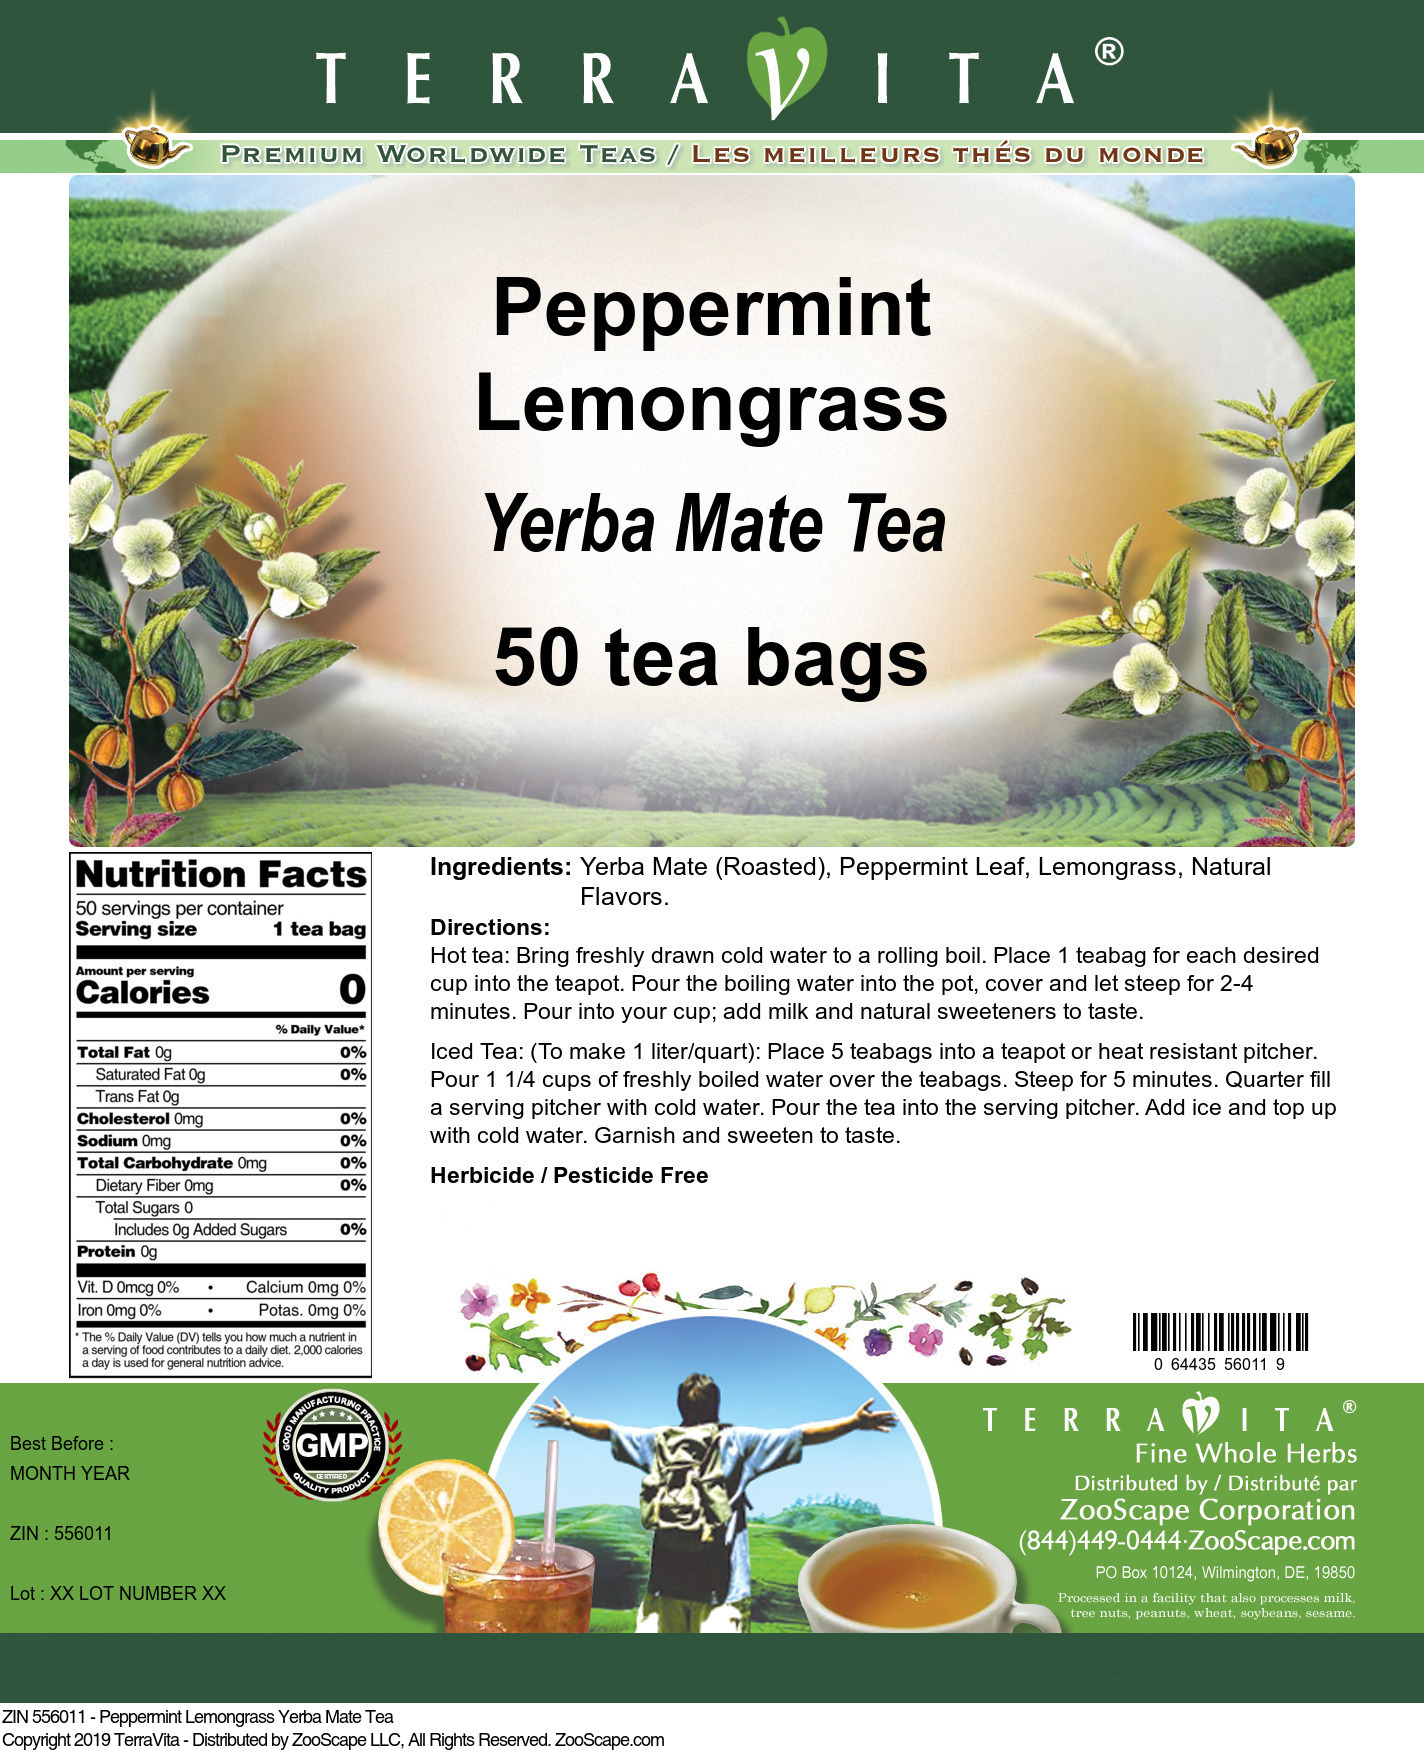 Peppermint Lemongrass Yerba Mate